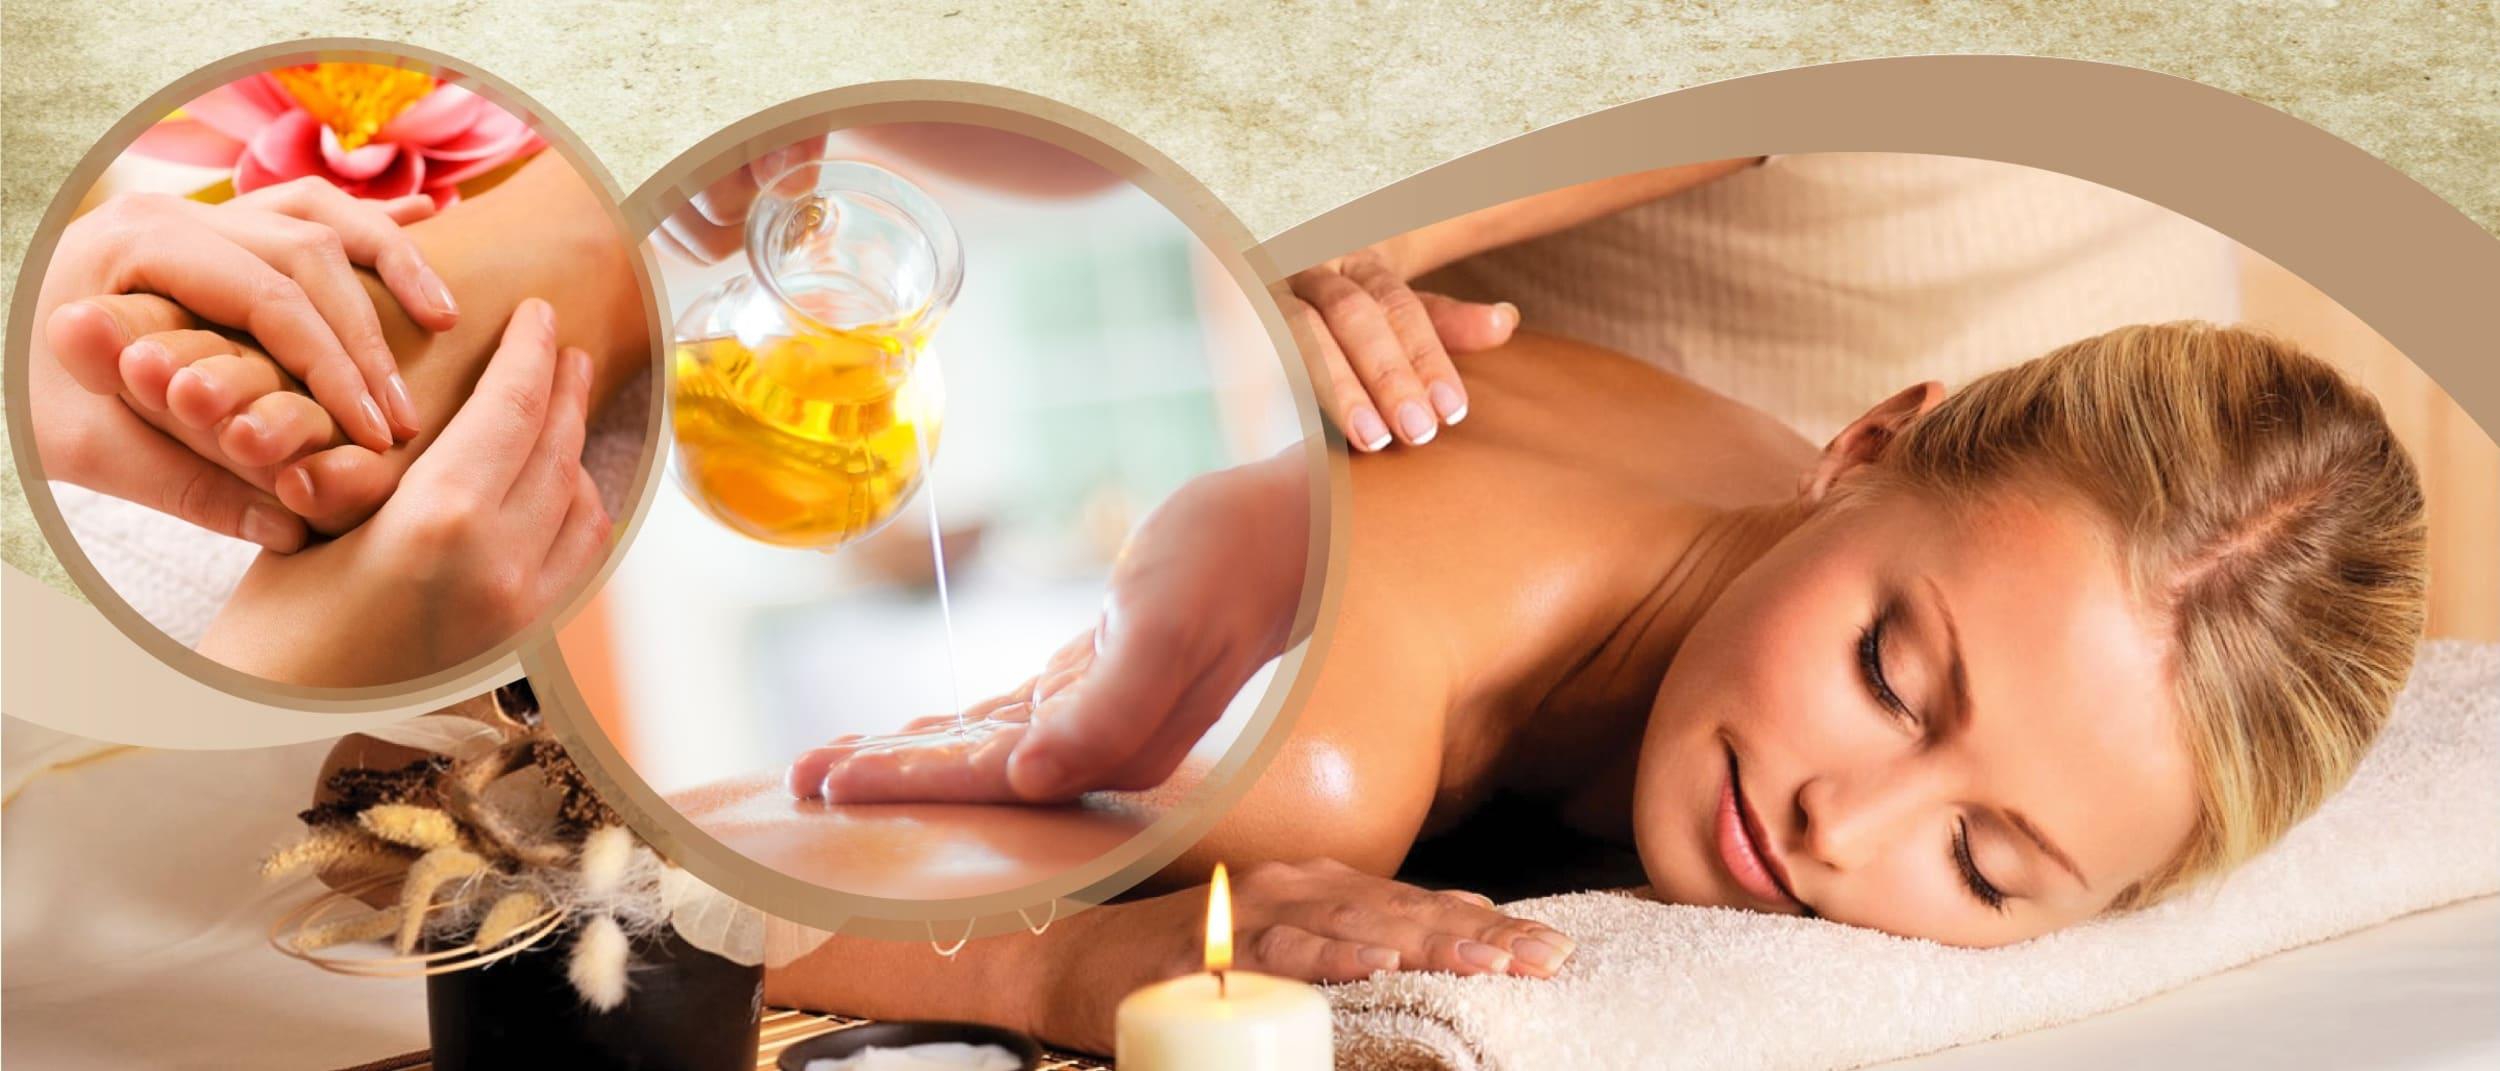 Lee Massage & Acupuncture: Autumn offer